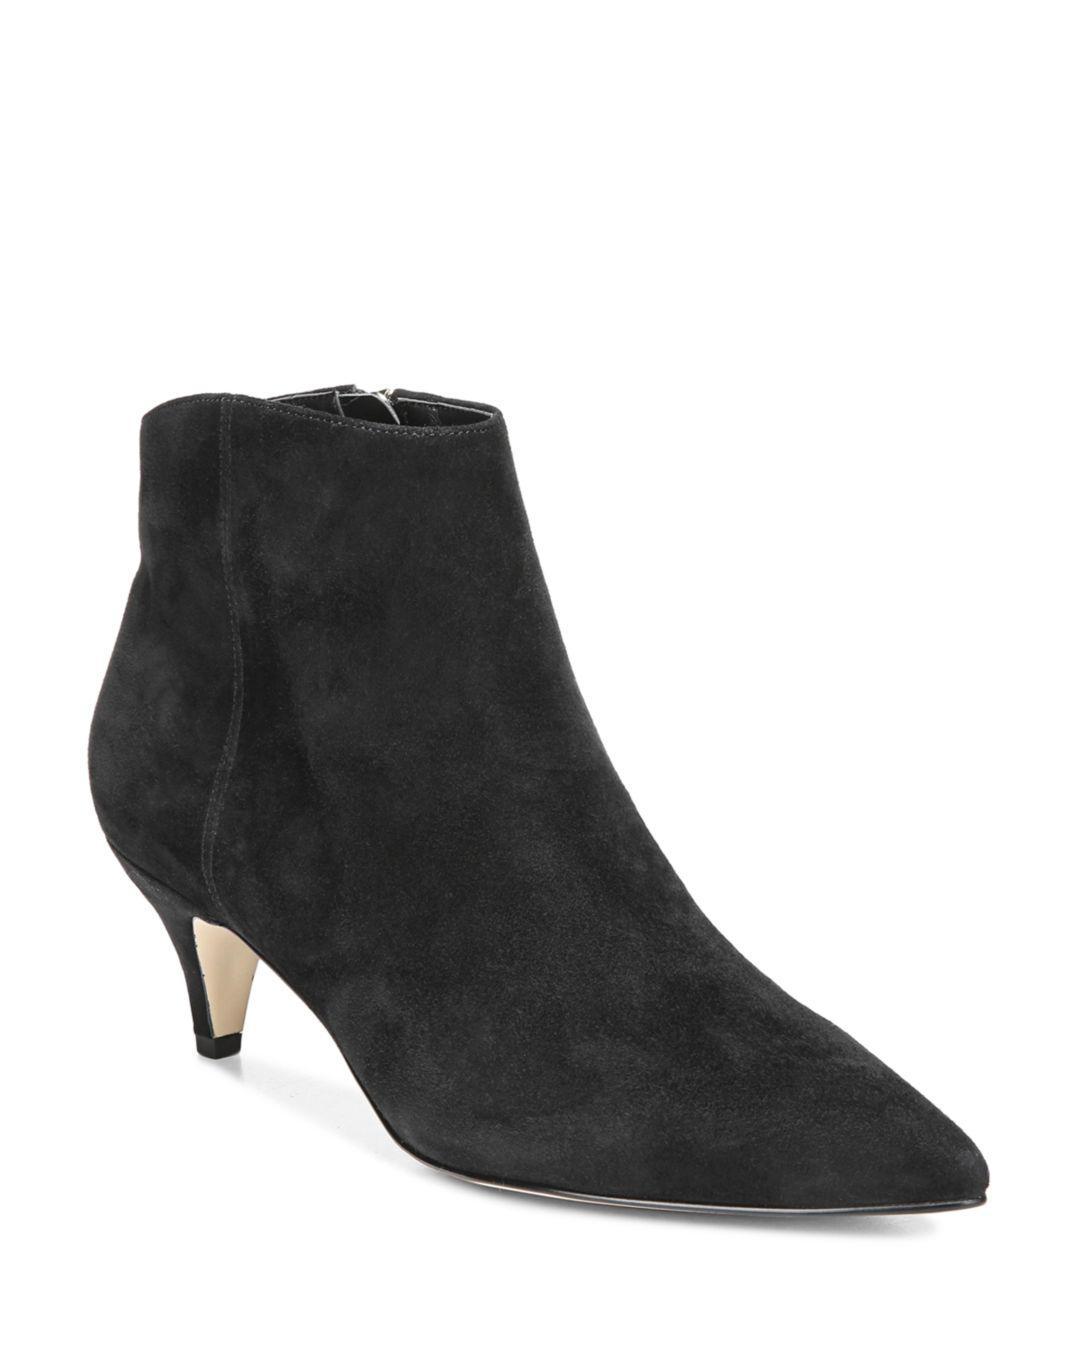 Sam Edelman Women s Kinzey Kitten-heel Booties in Black - Lyst b5da3f074